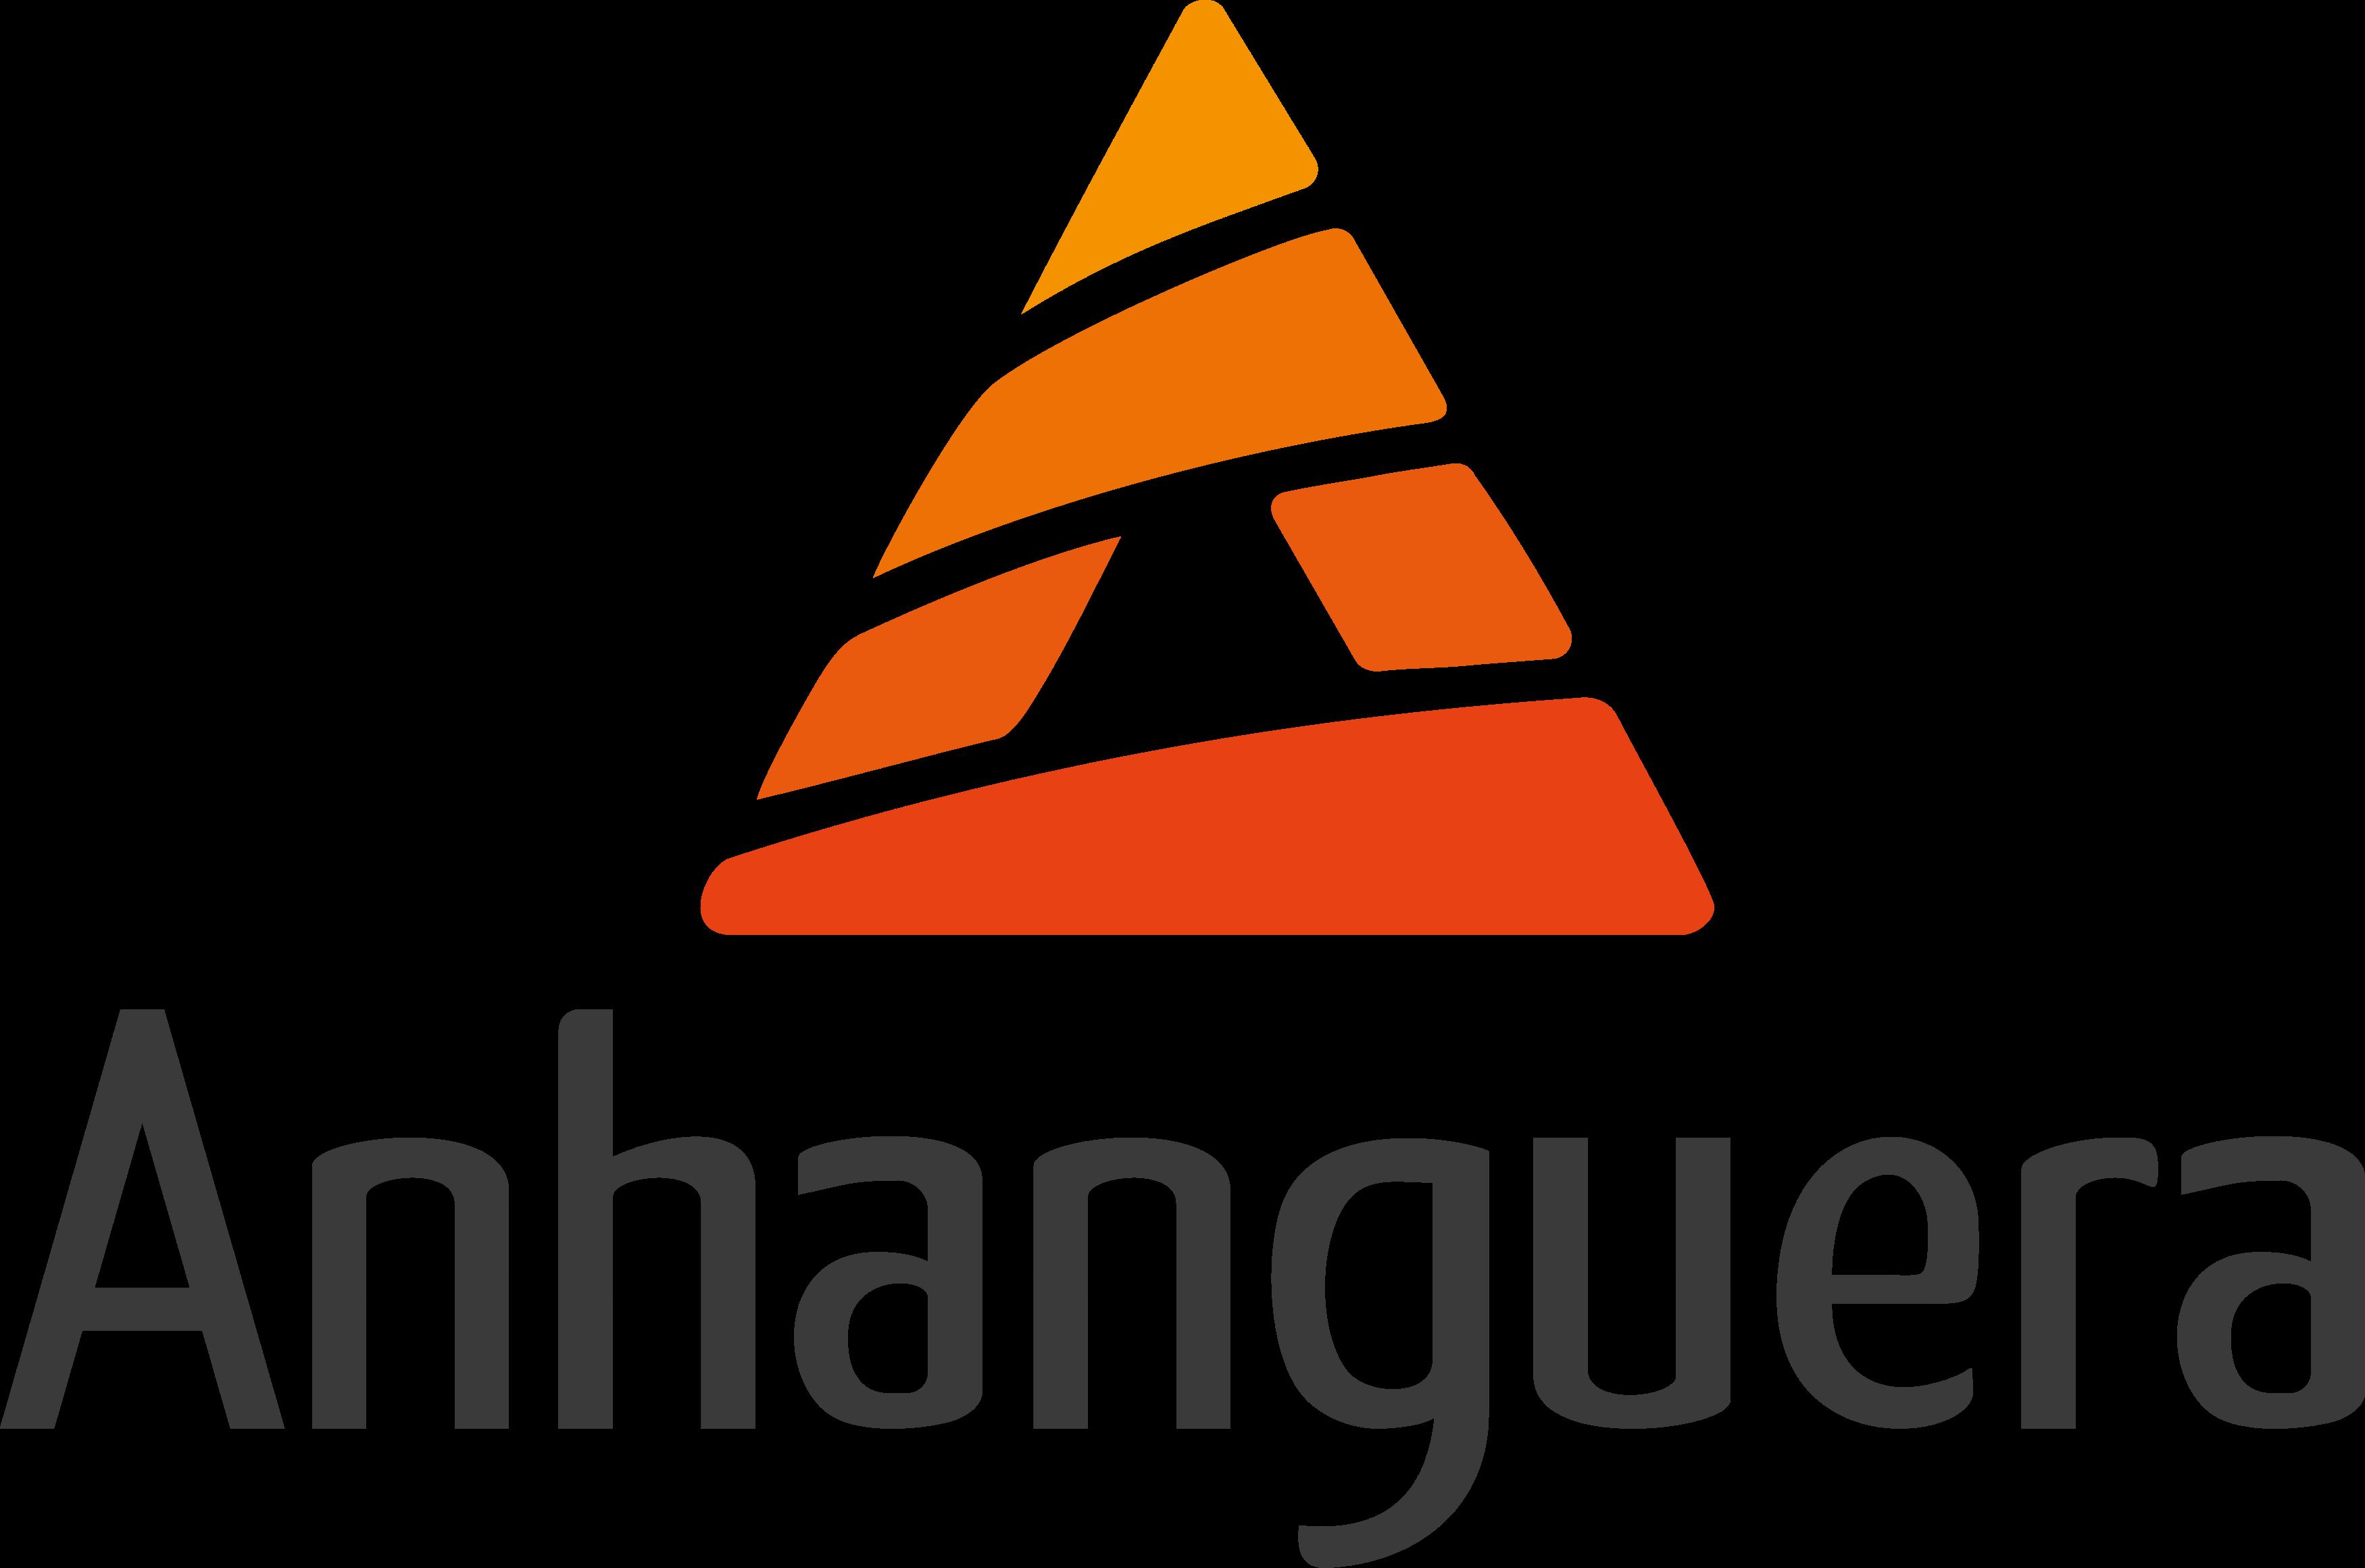 universidade-anhanguera-logo-1